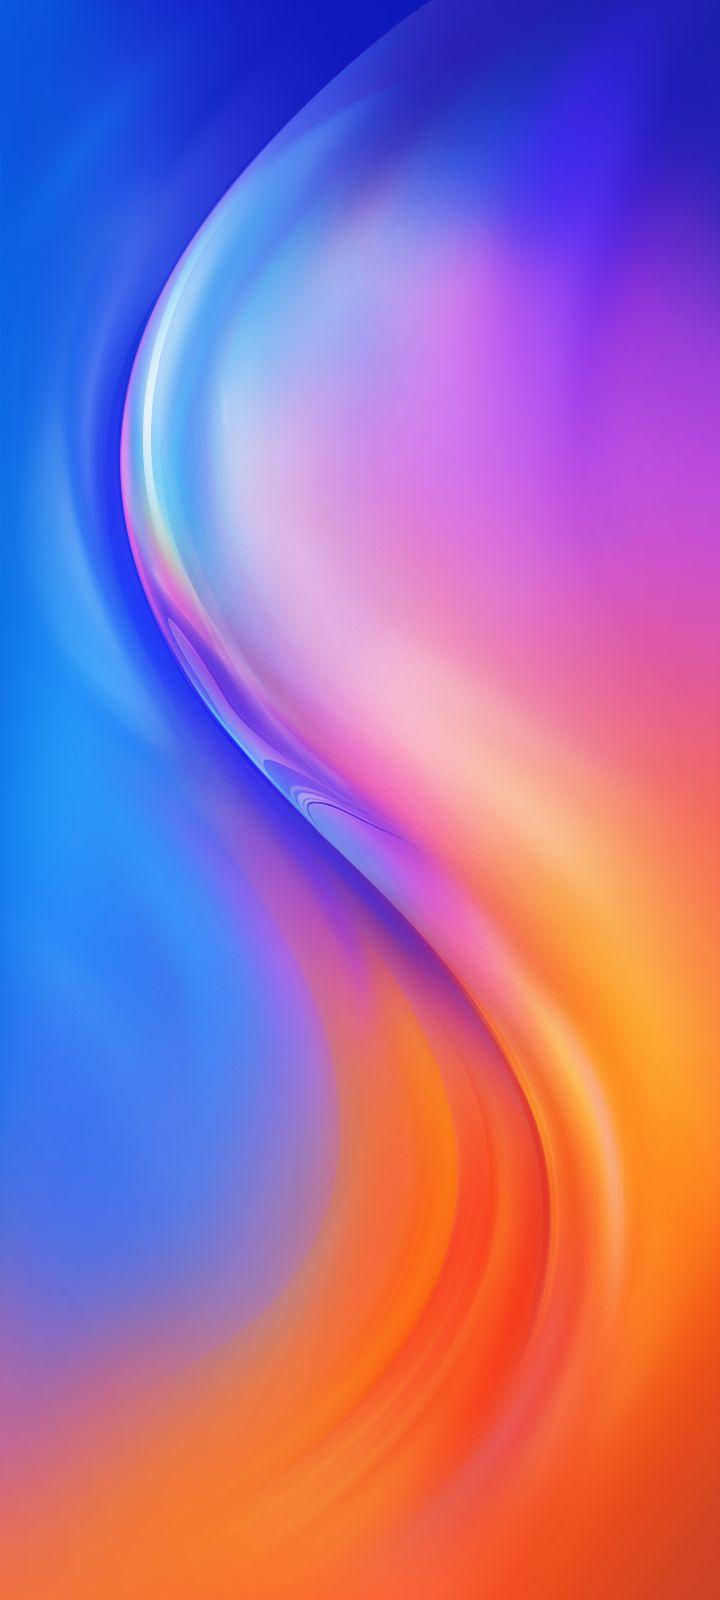 Tecno Spark Go 2020 Stock Wallpaper [720x1600] - 01